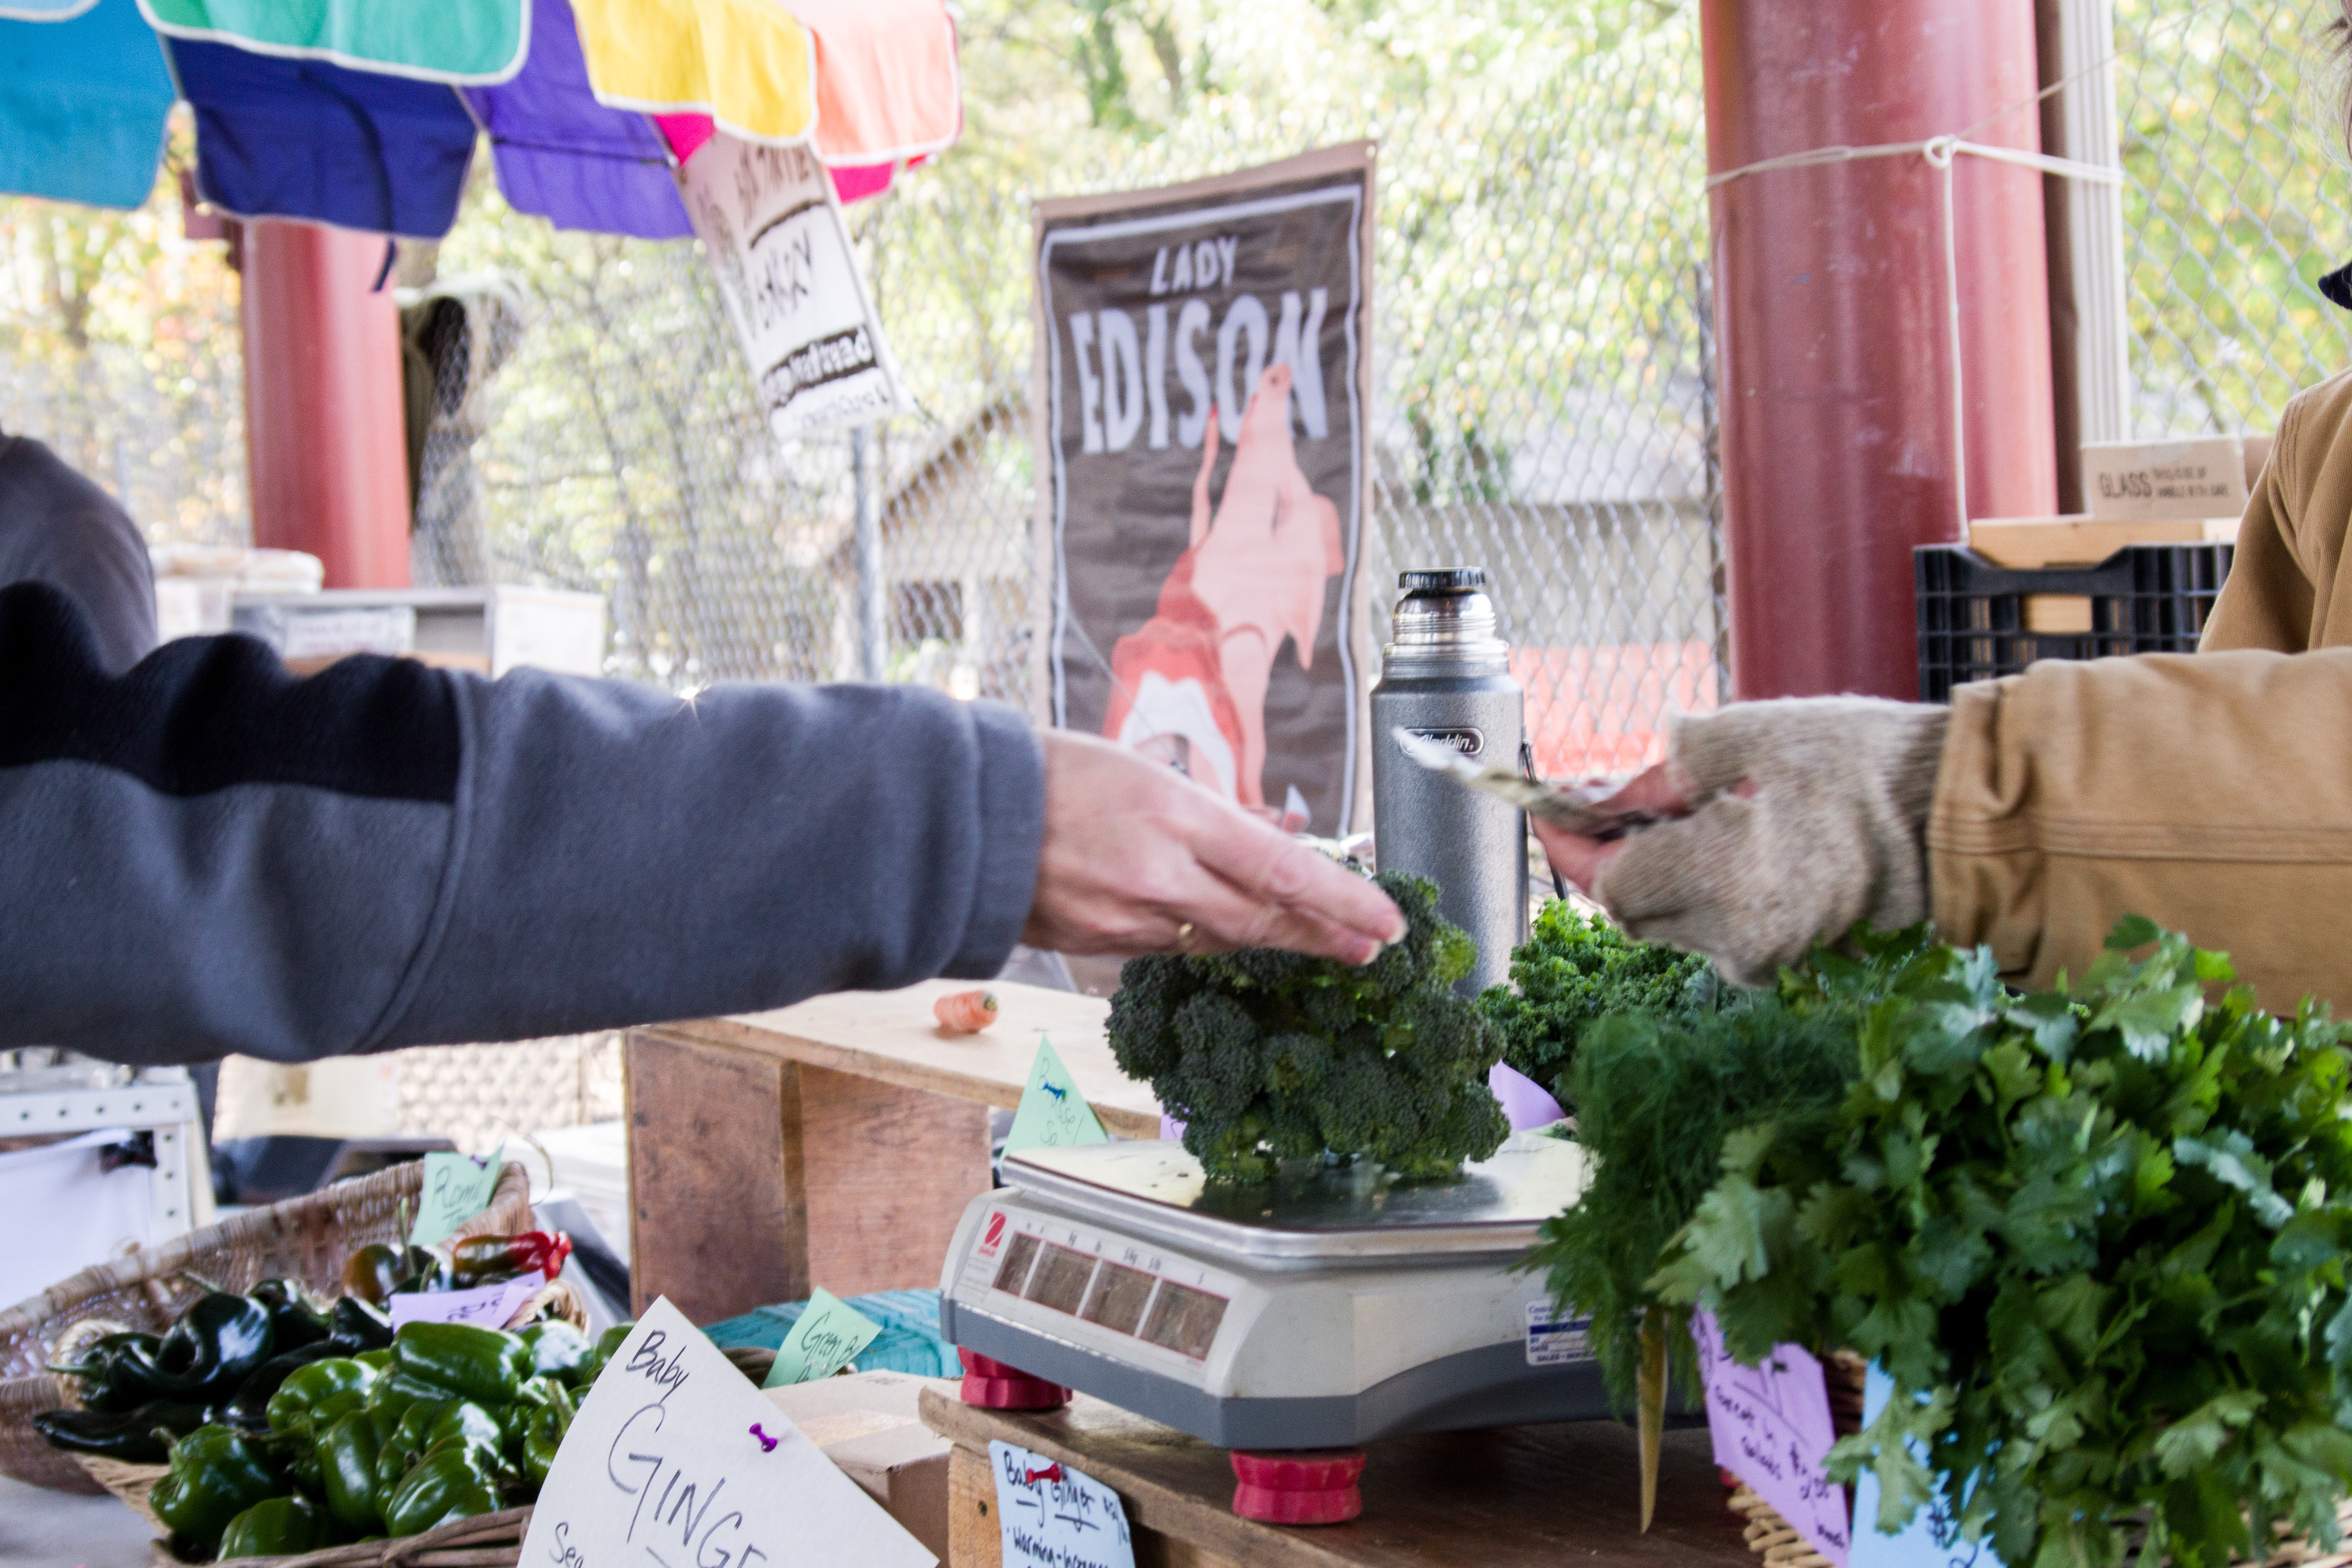 A customer buying fresh produce from a vendor at a farmer's market. Photo © Jillian Regan 2017